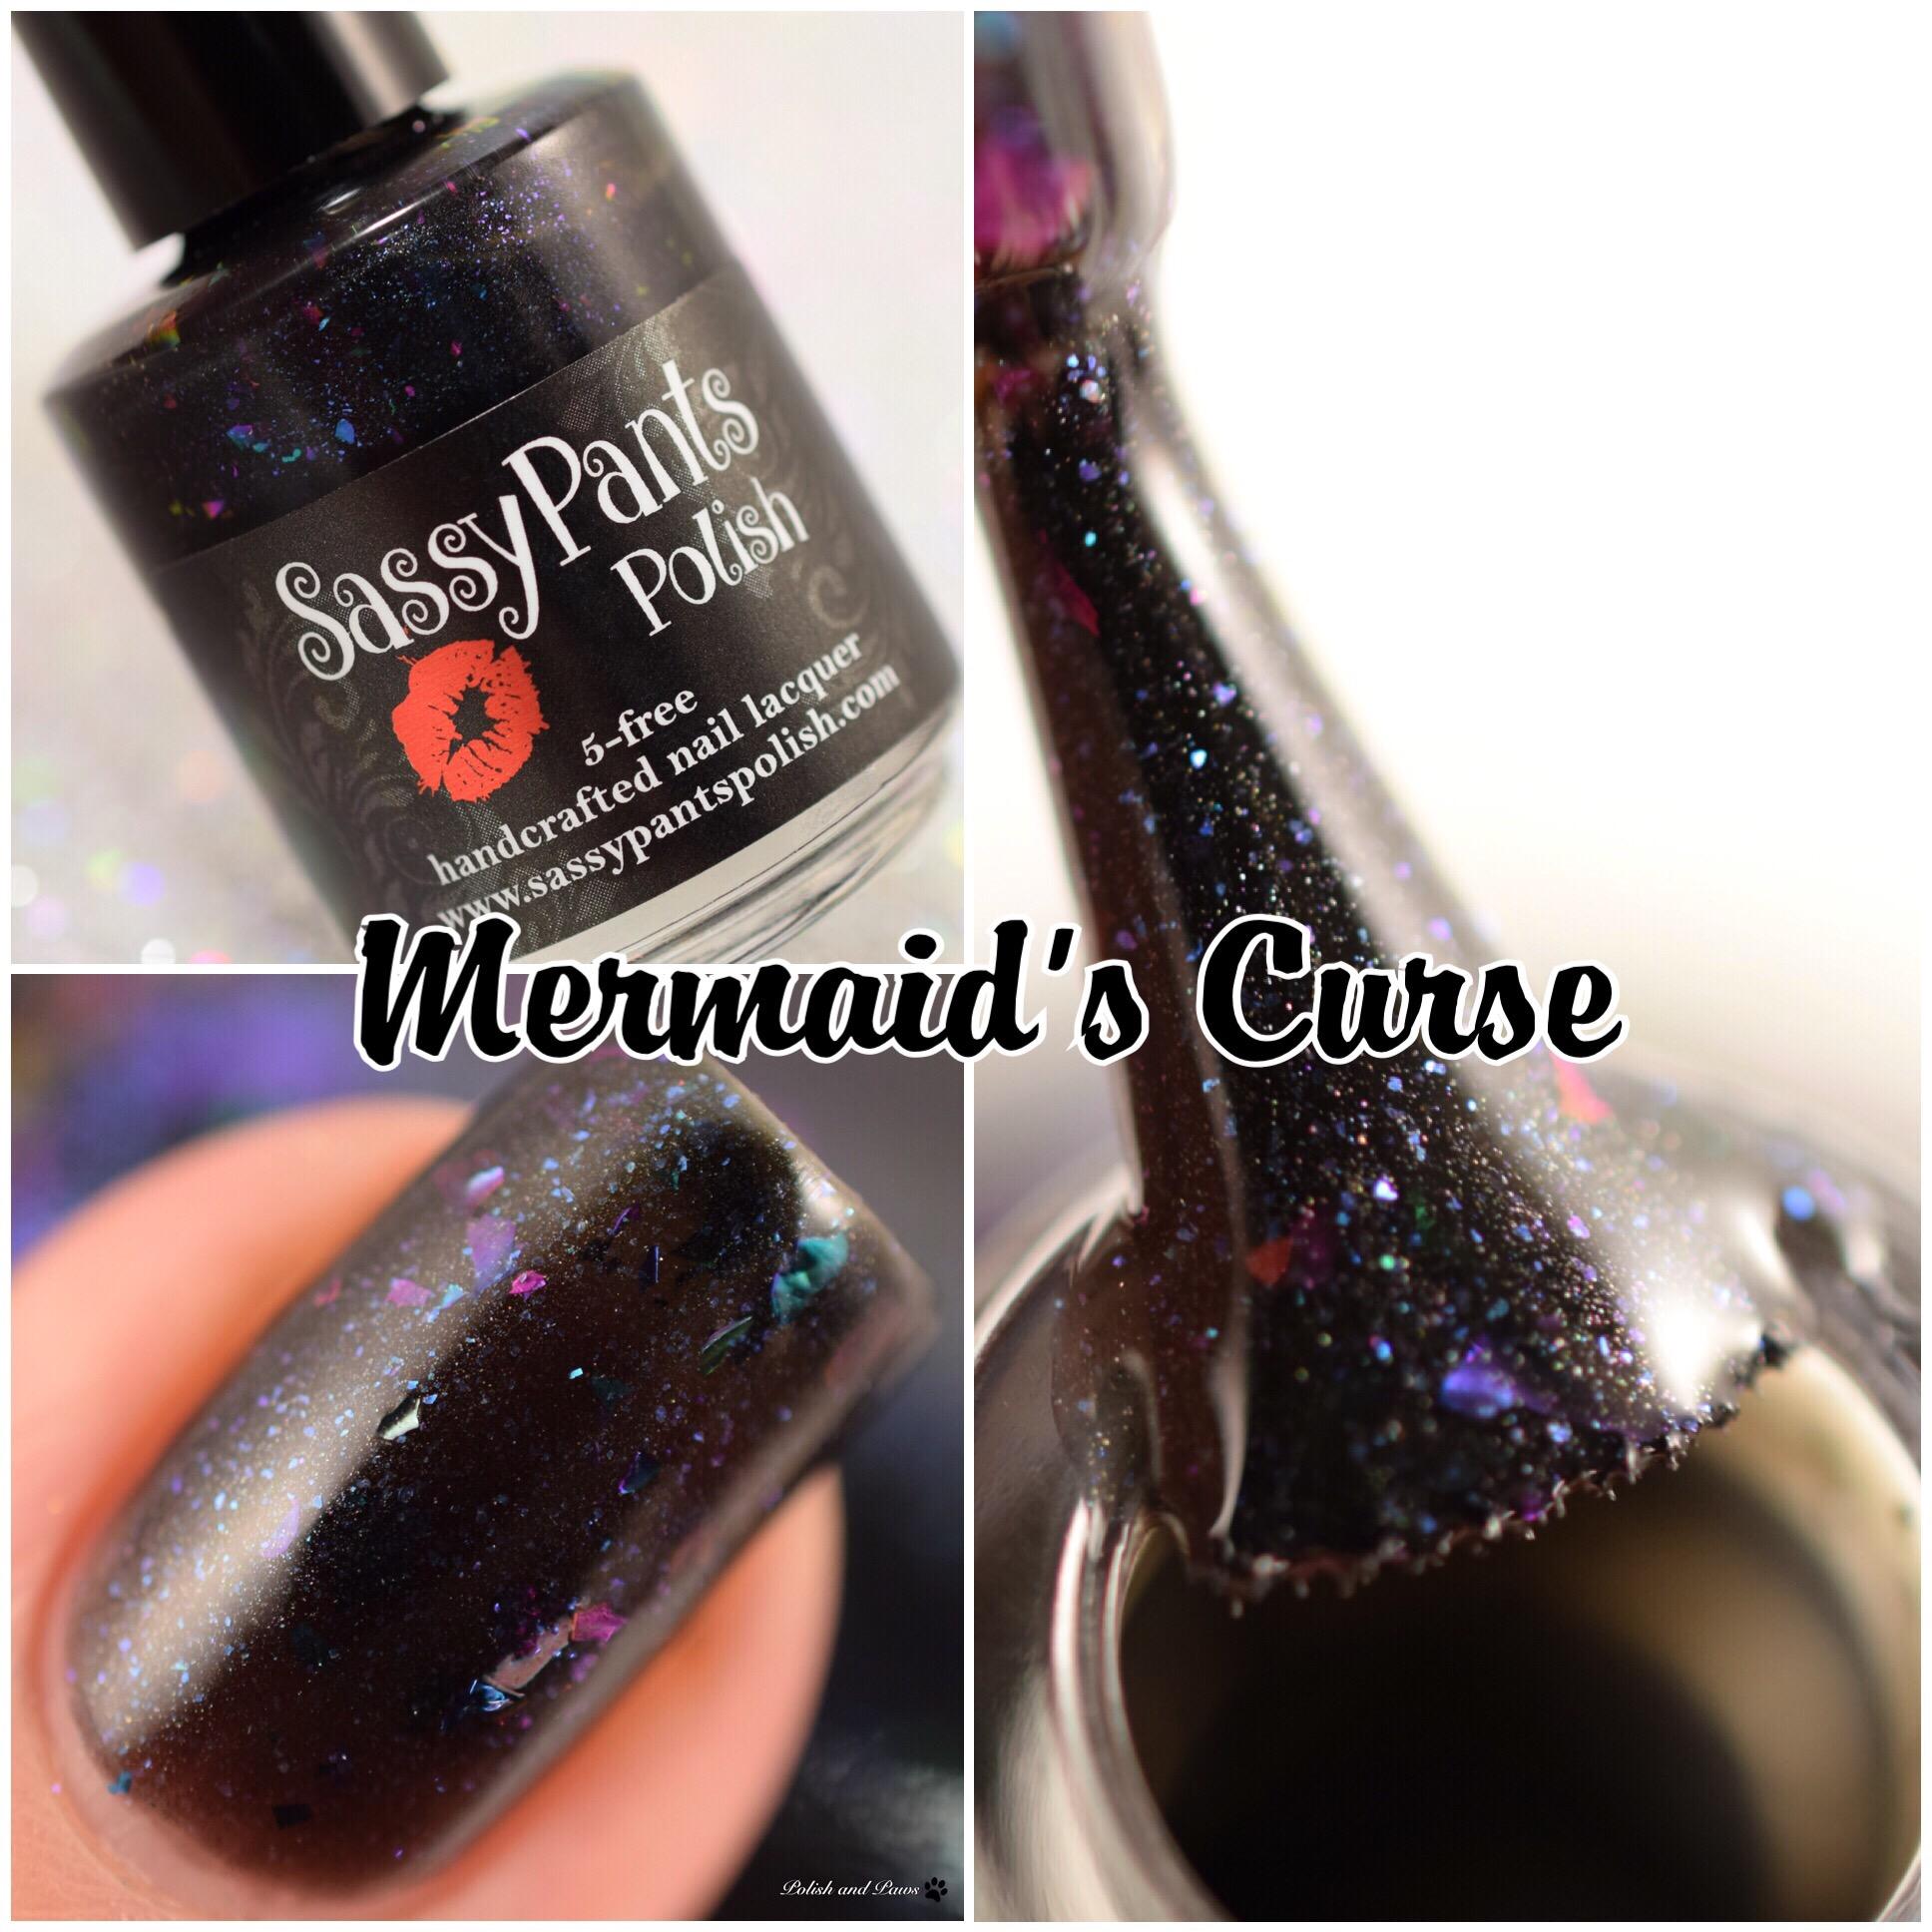 Sassy Pants Polish Mermaid's Curse